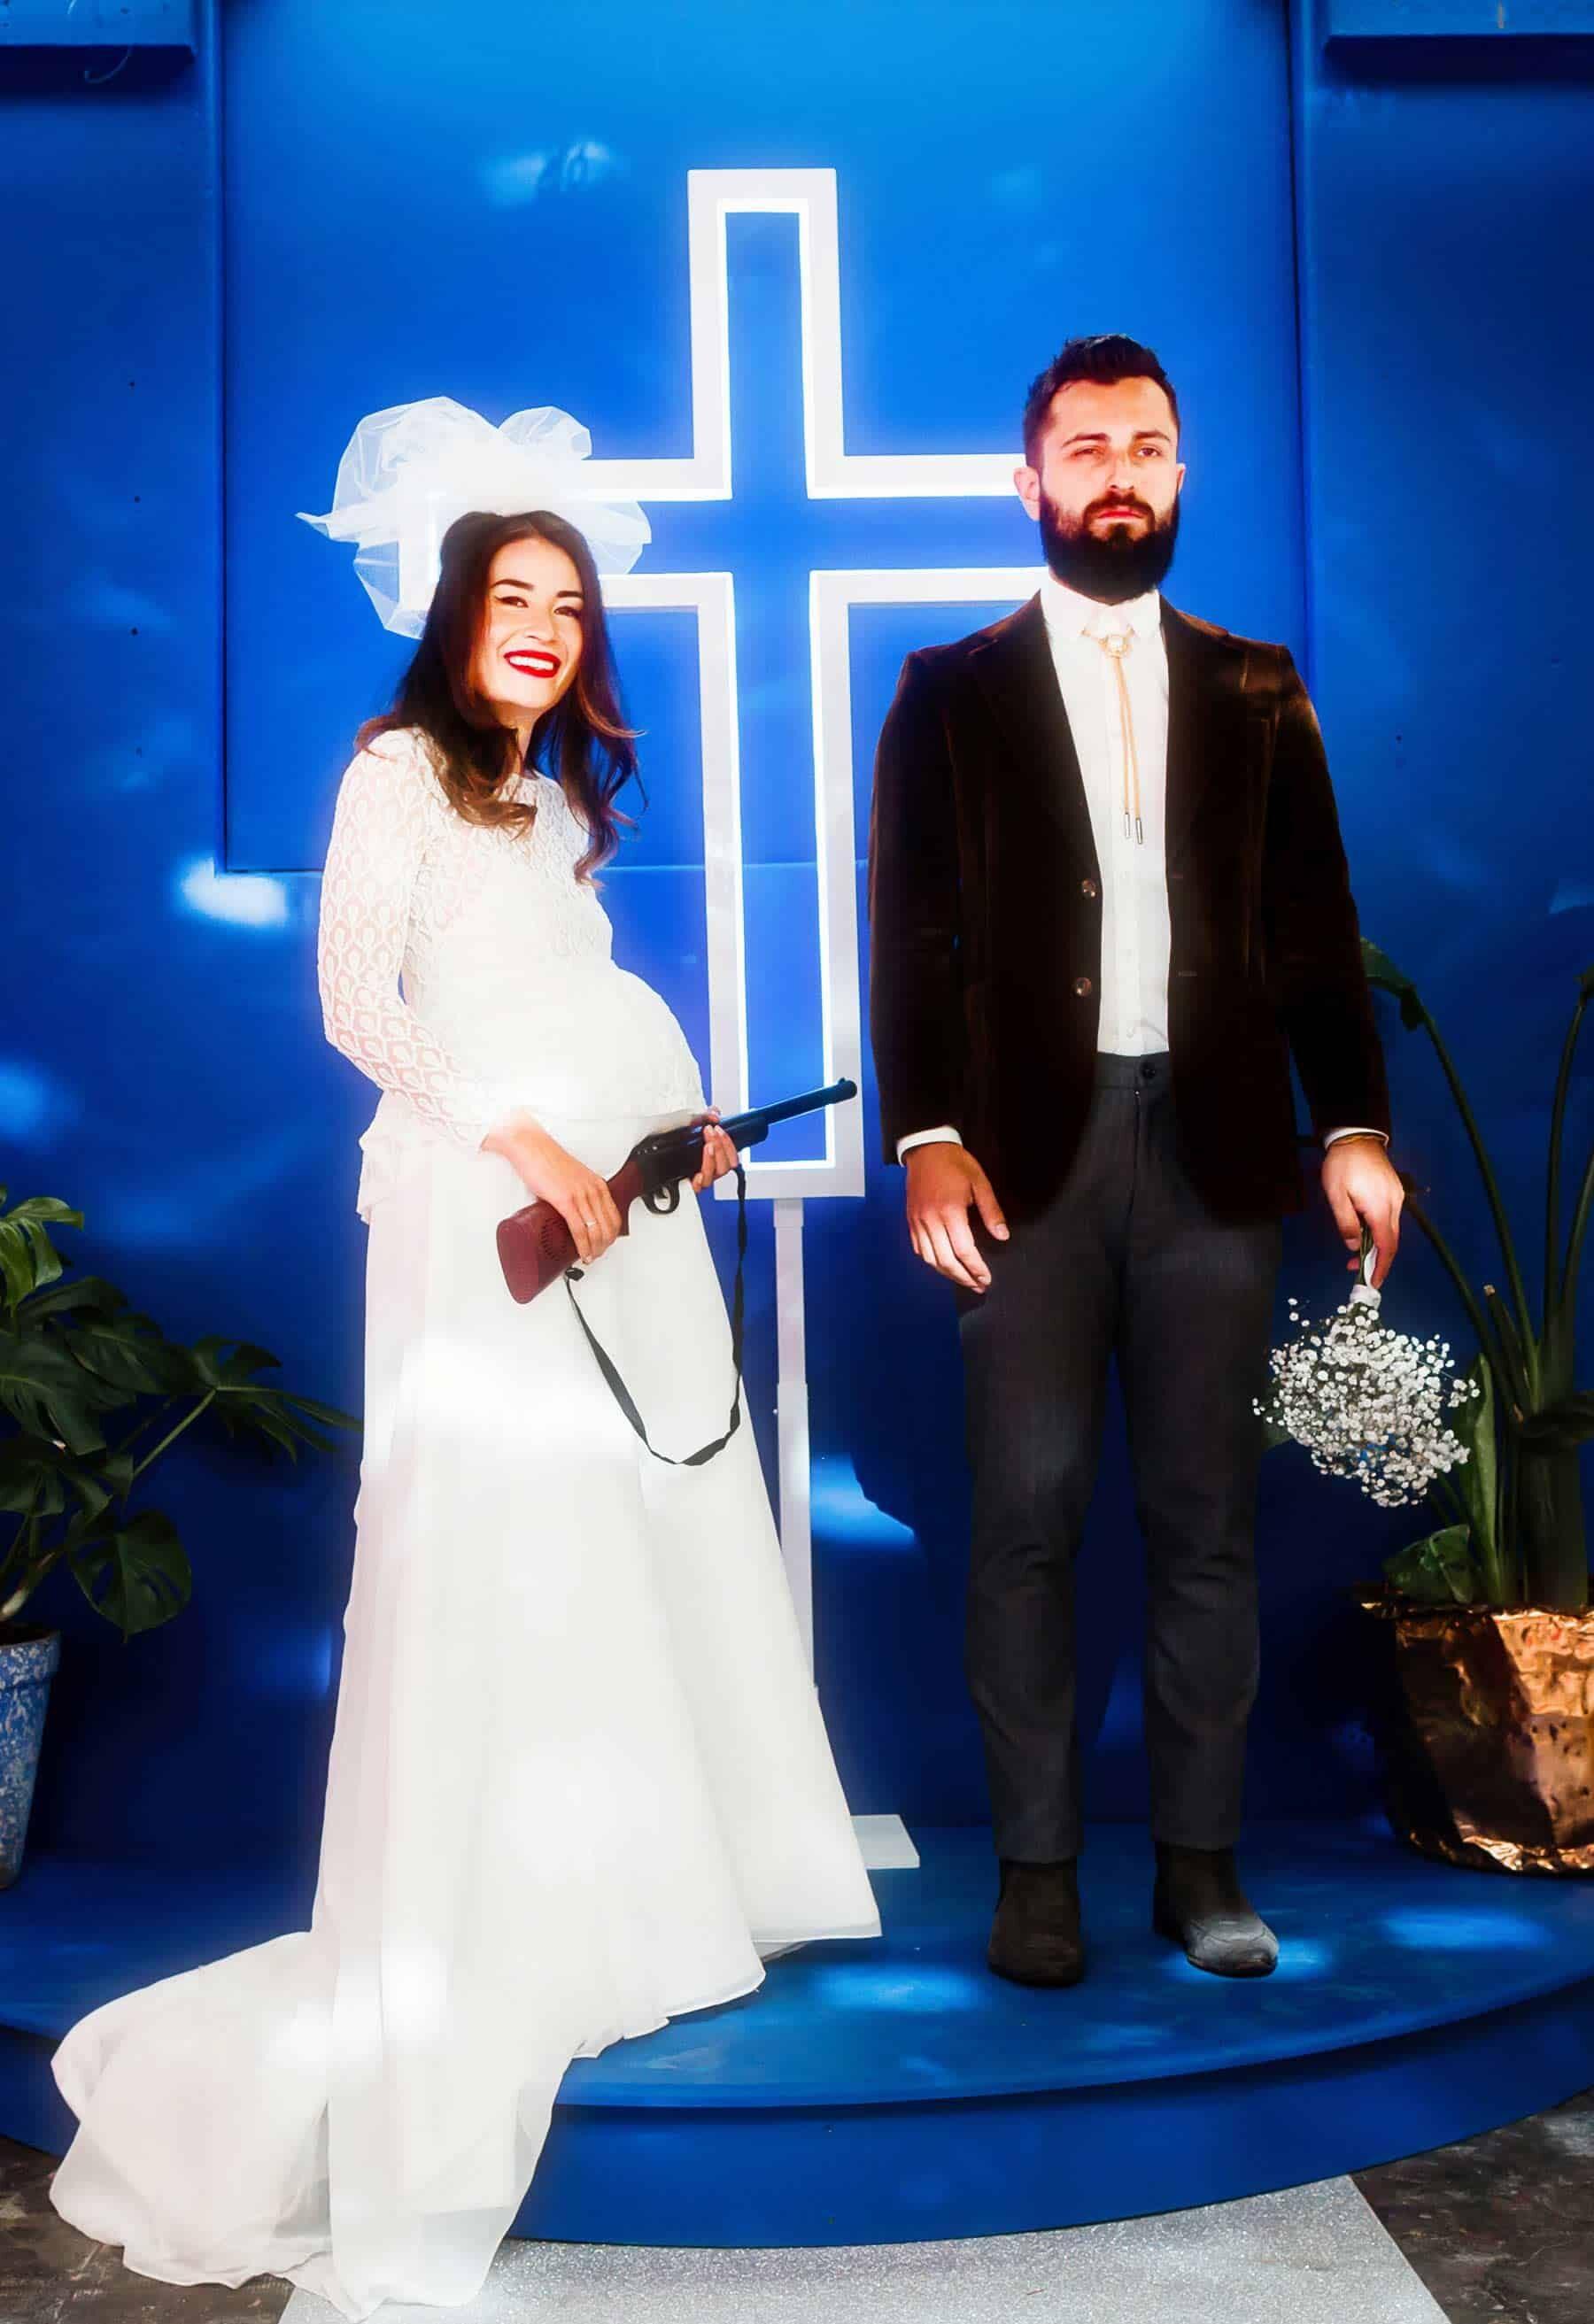 LED cross wedding backdrop